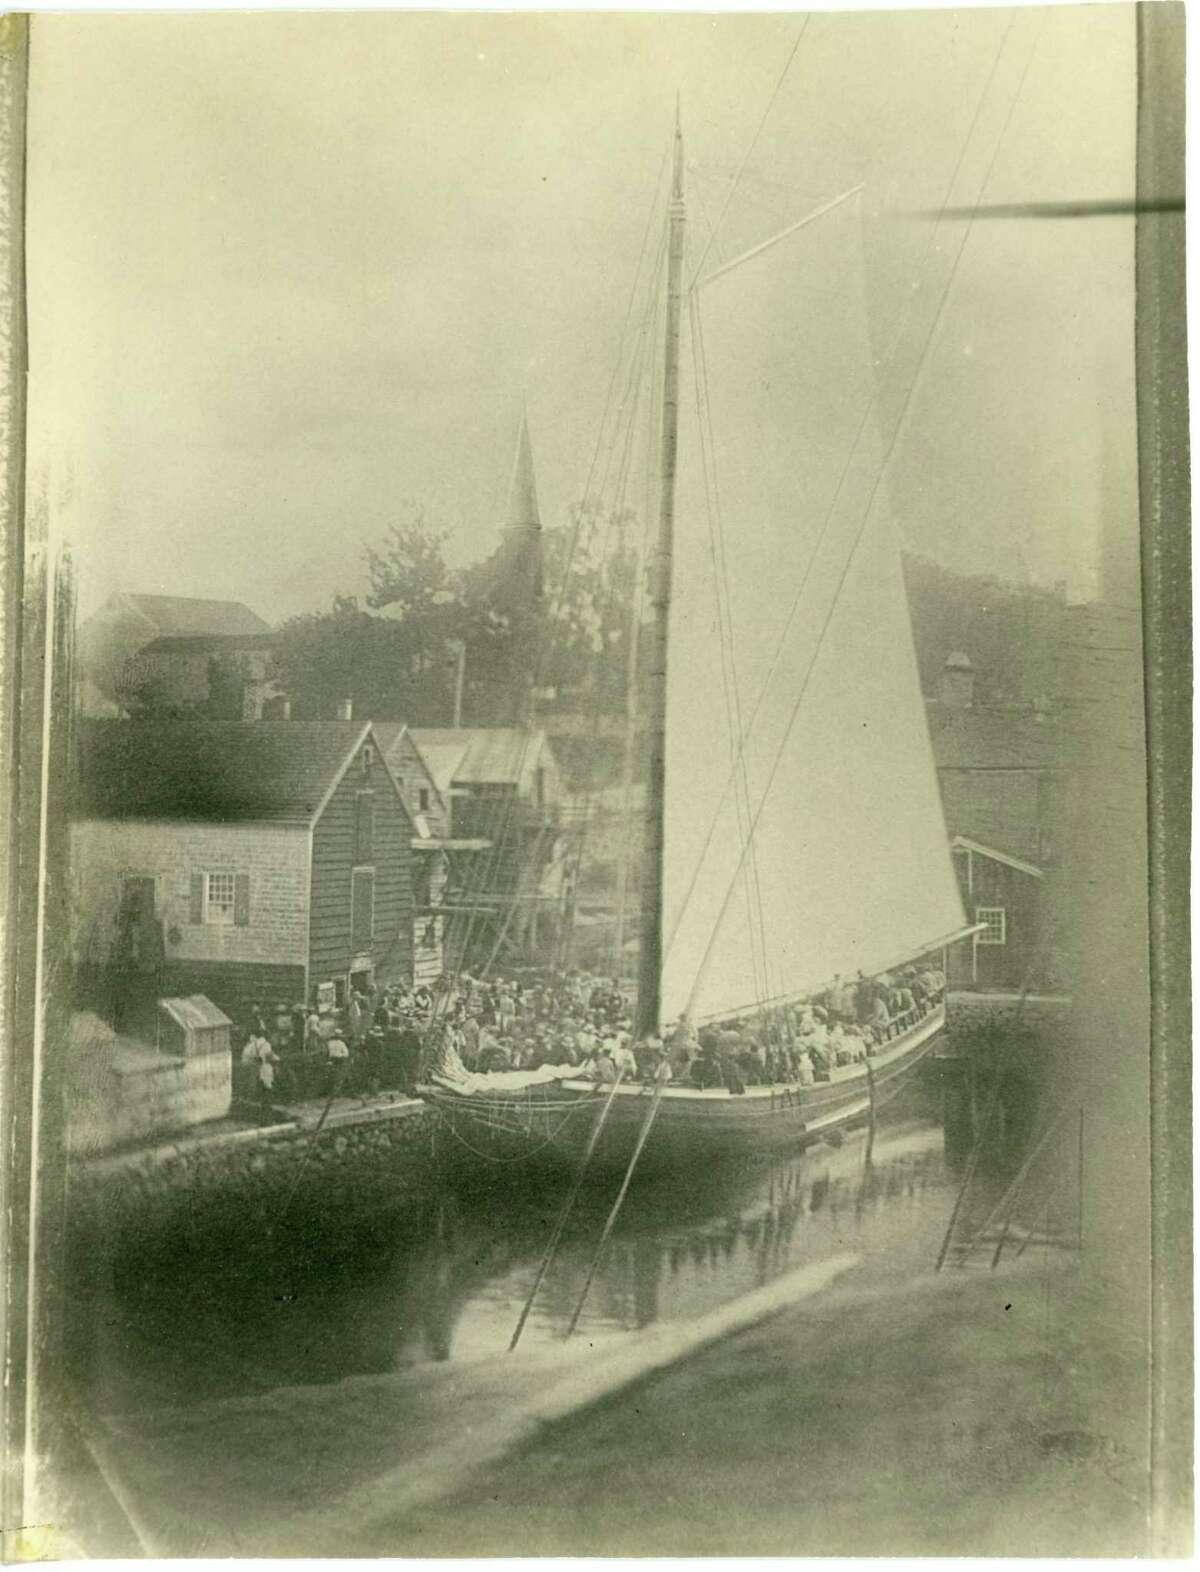 This circa 1850 photograph of the merchant sloop